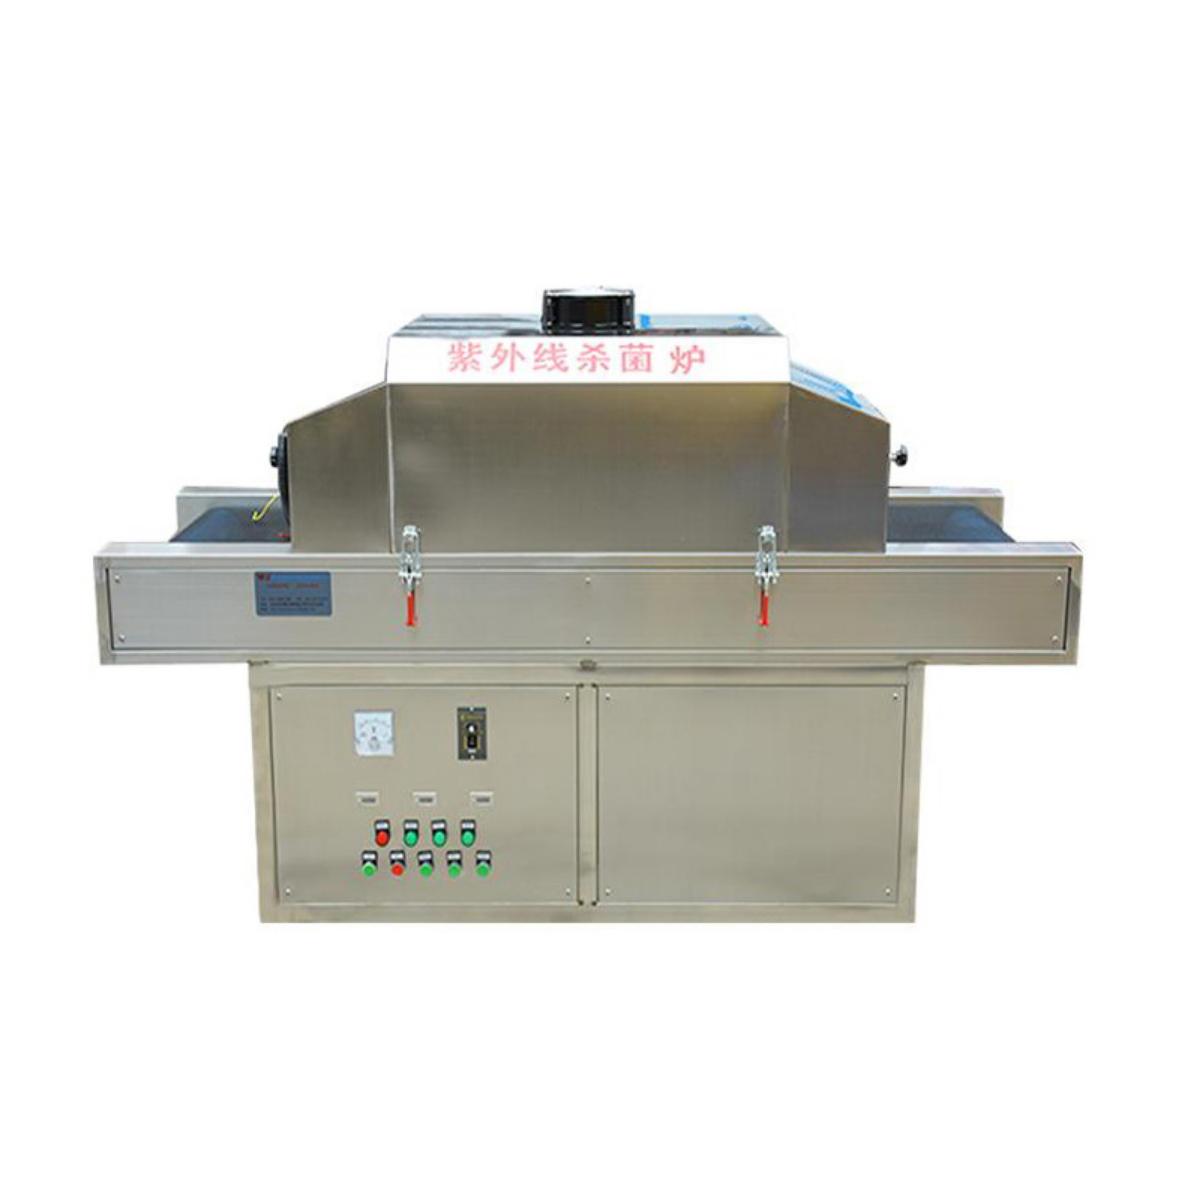 Ultraviolet Germicidal Irradiation Equipment